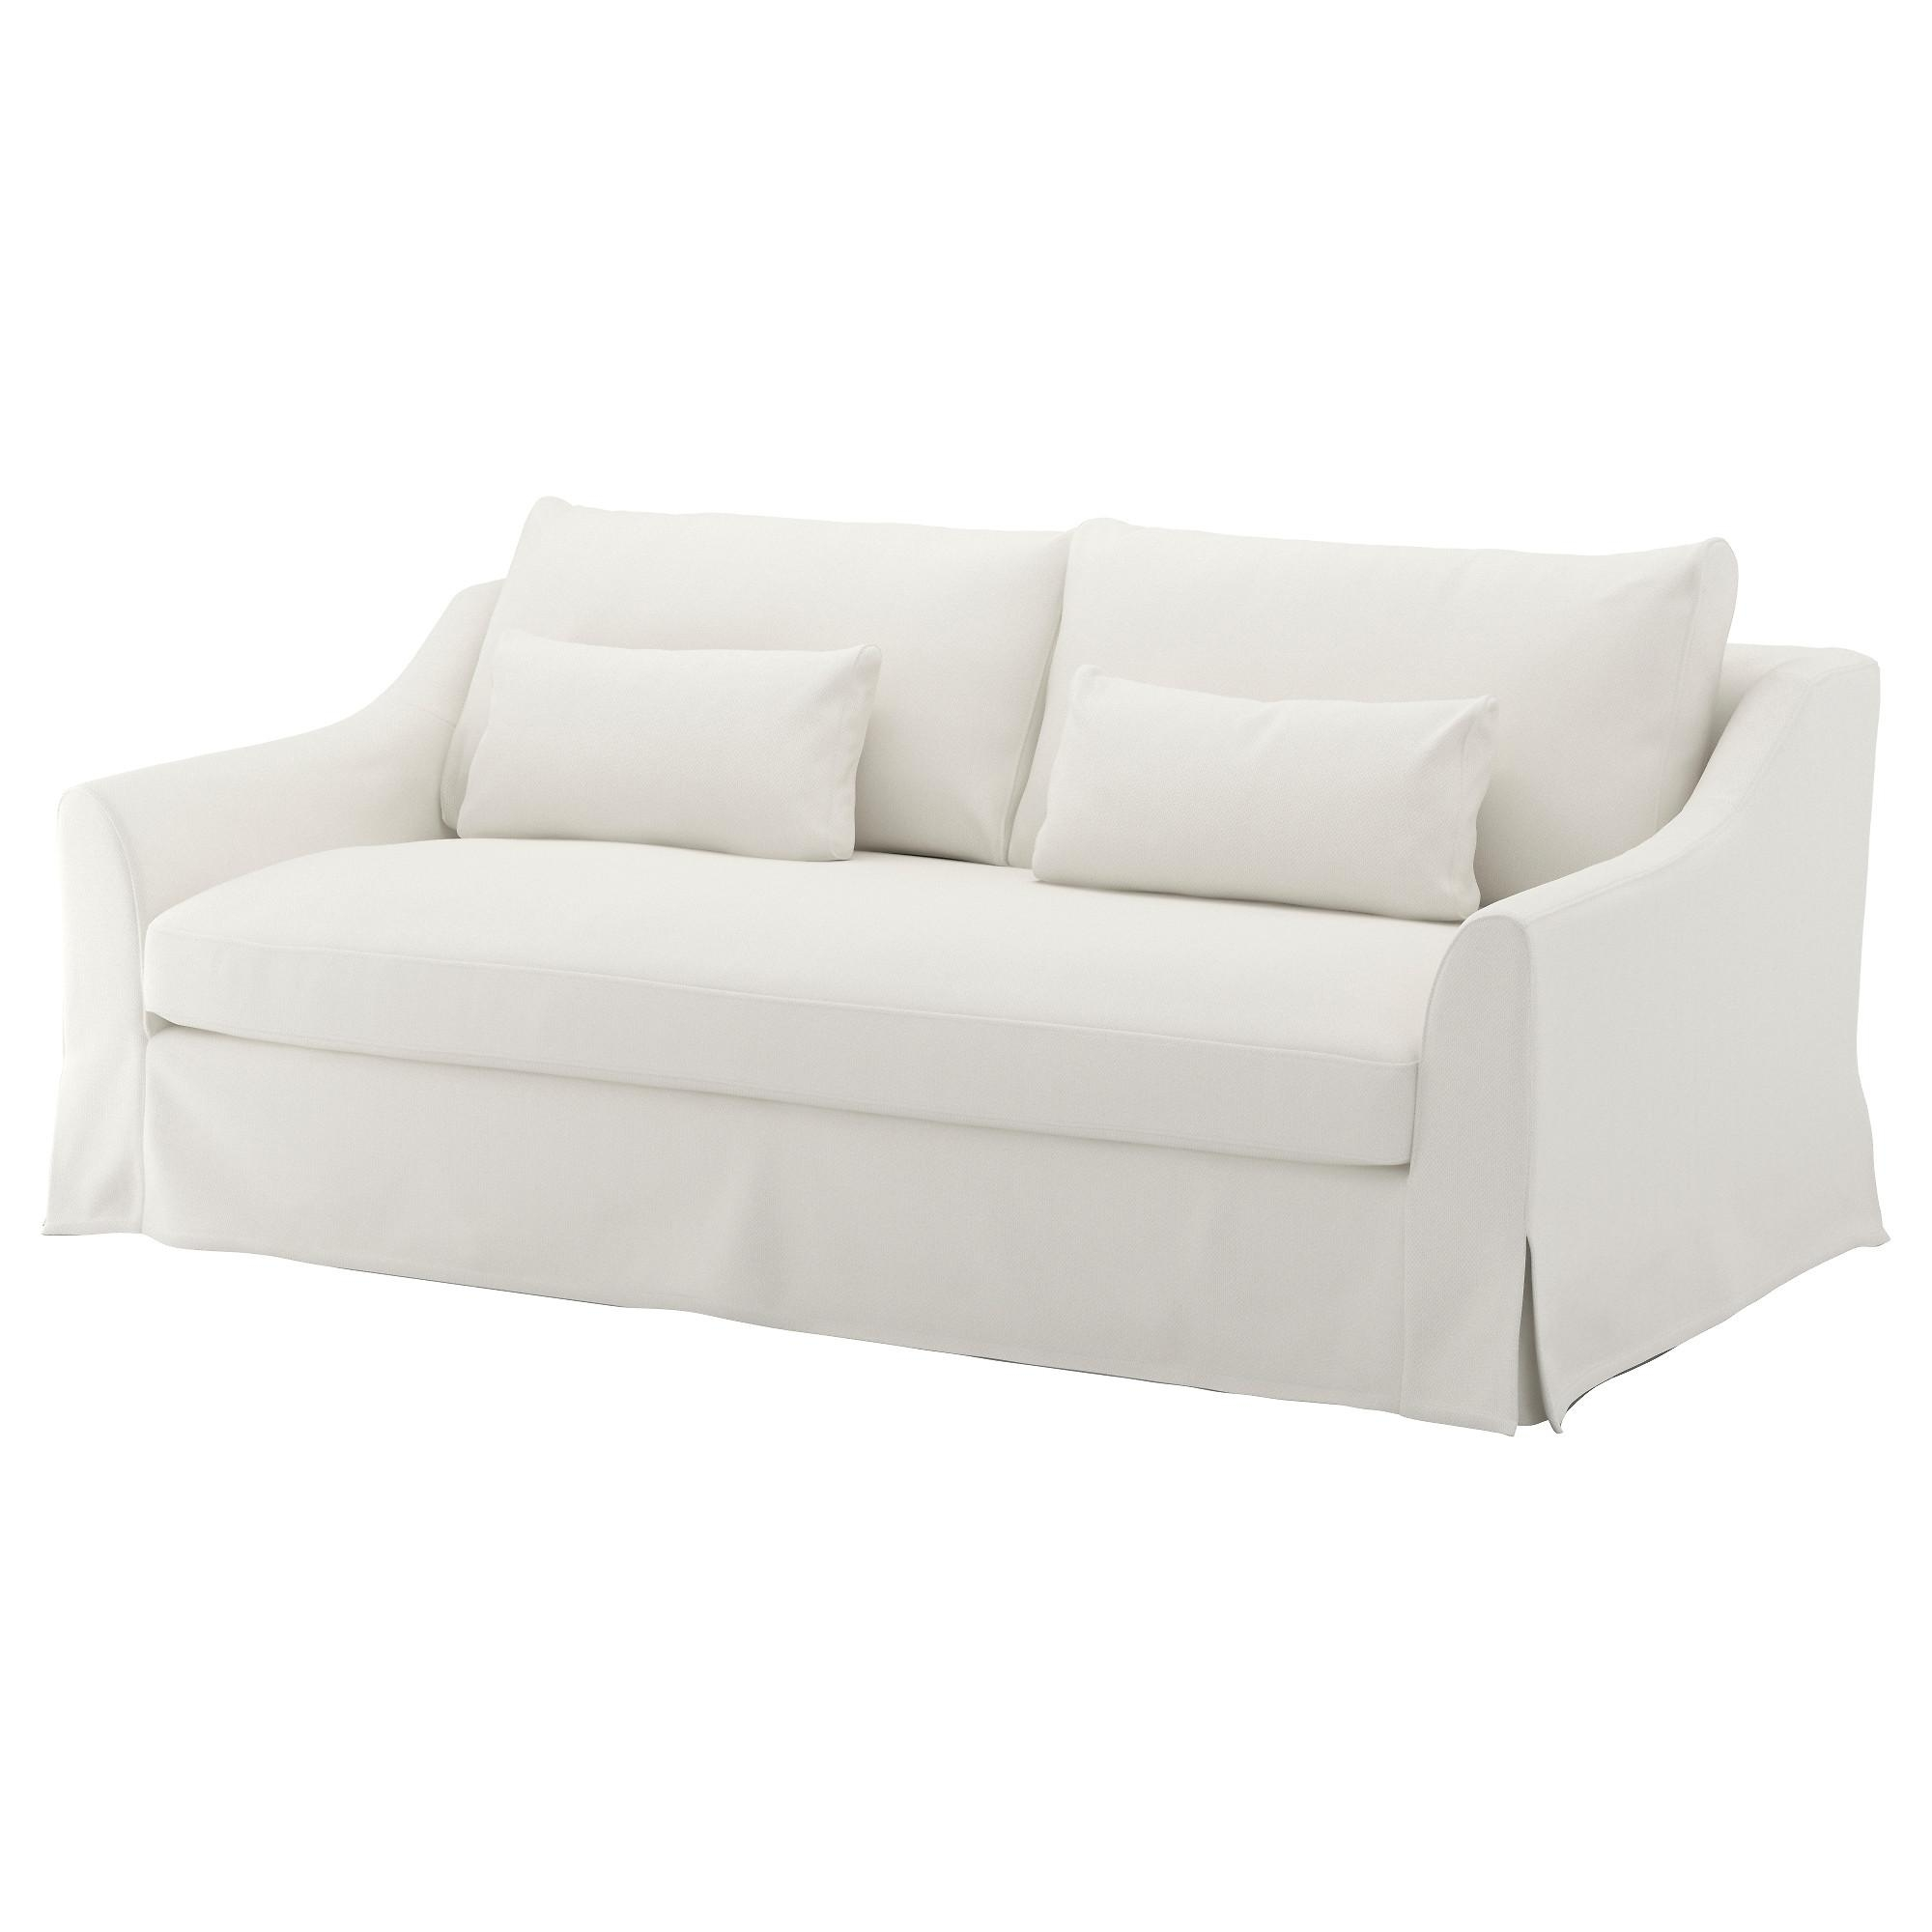 black sofa white furniture ligne roset nomade 20 photos and sofas ideas